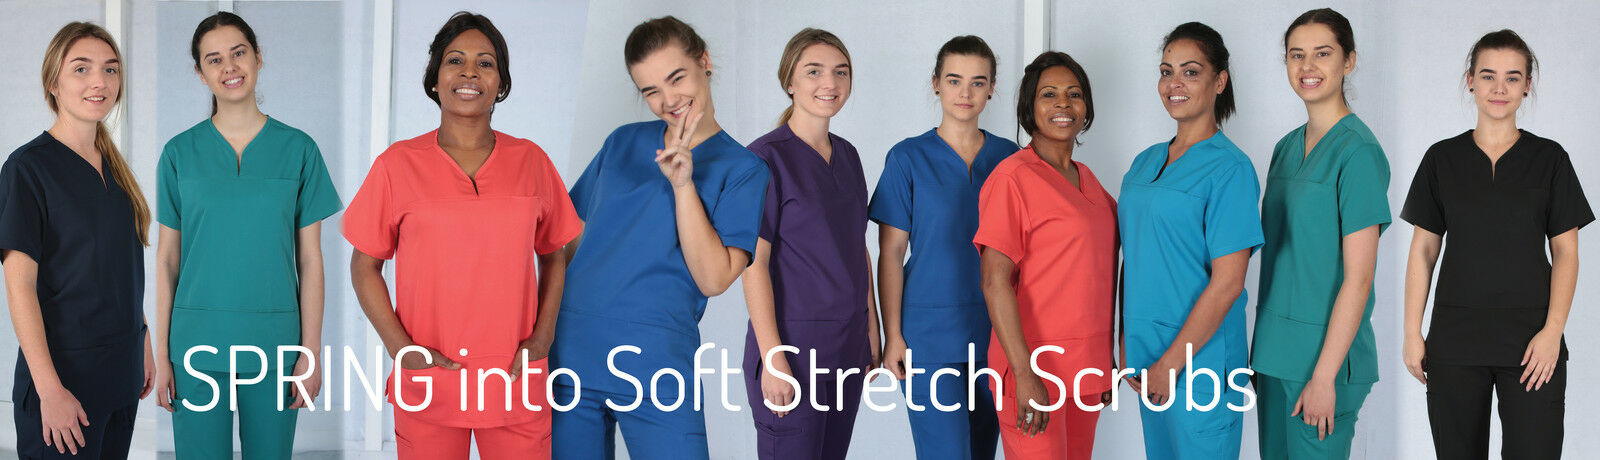 Healthcare Uniforms Australia